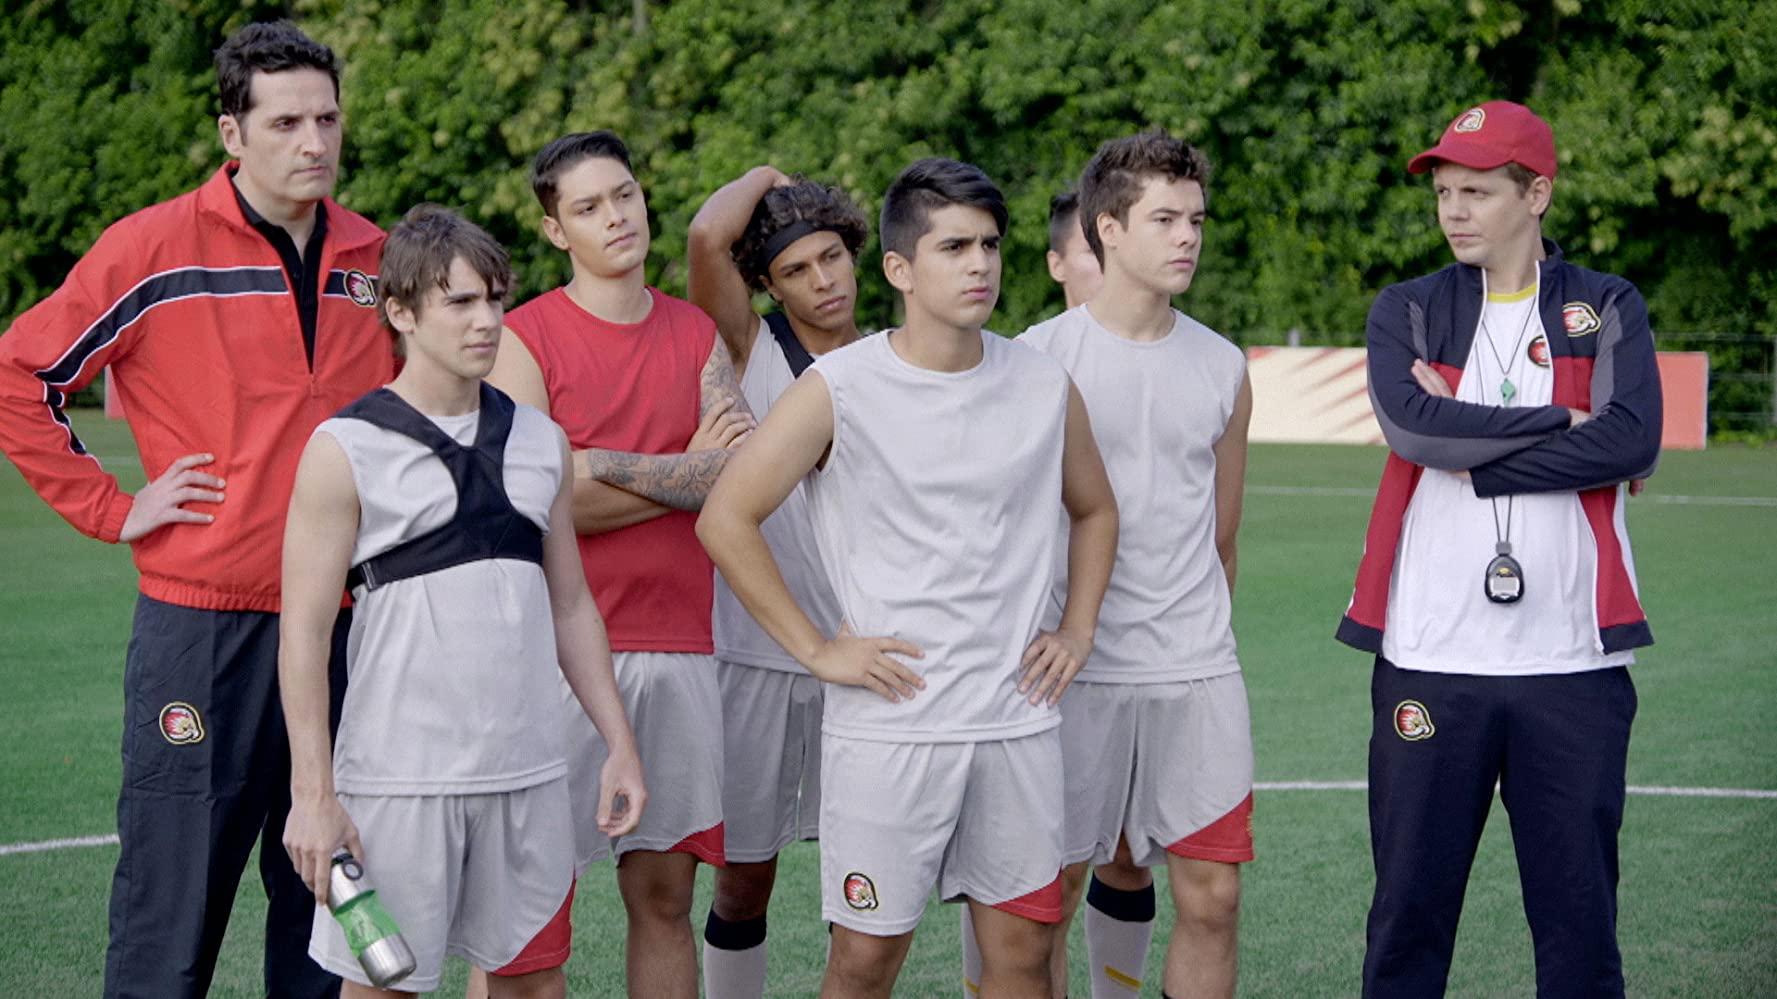 Unsprezece 11 Sezonul 2 Episodul 12 Dublat în Română